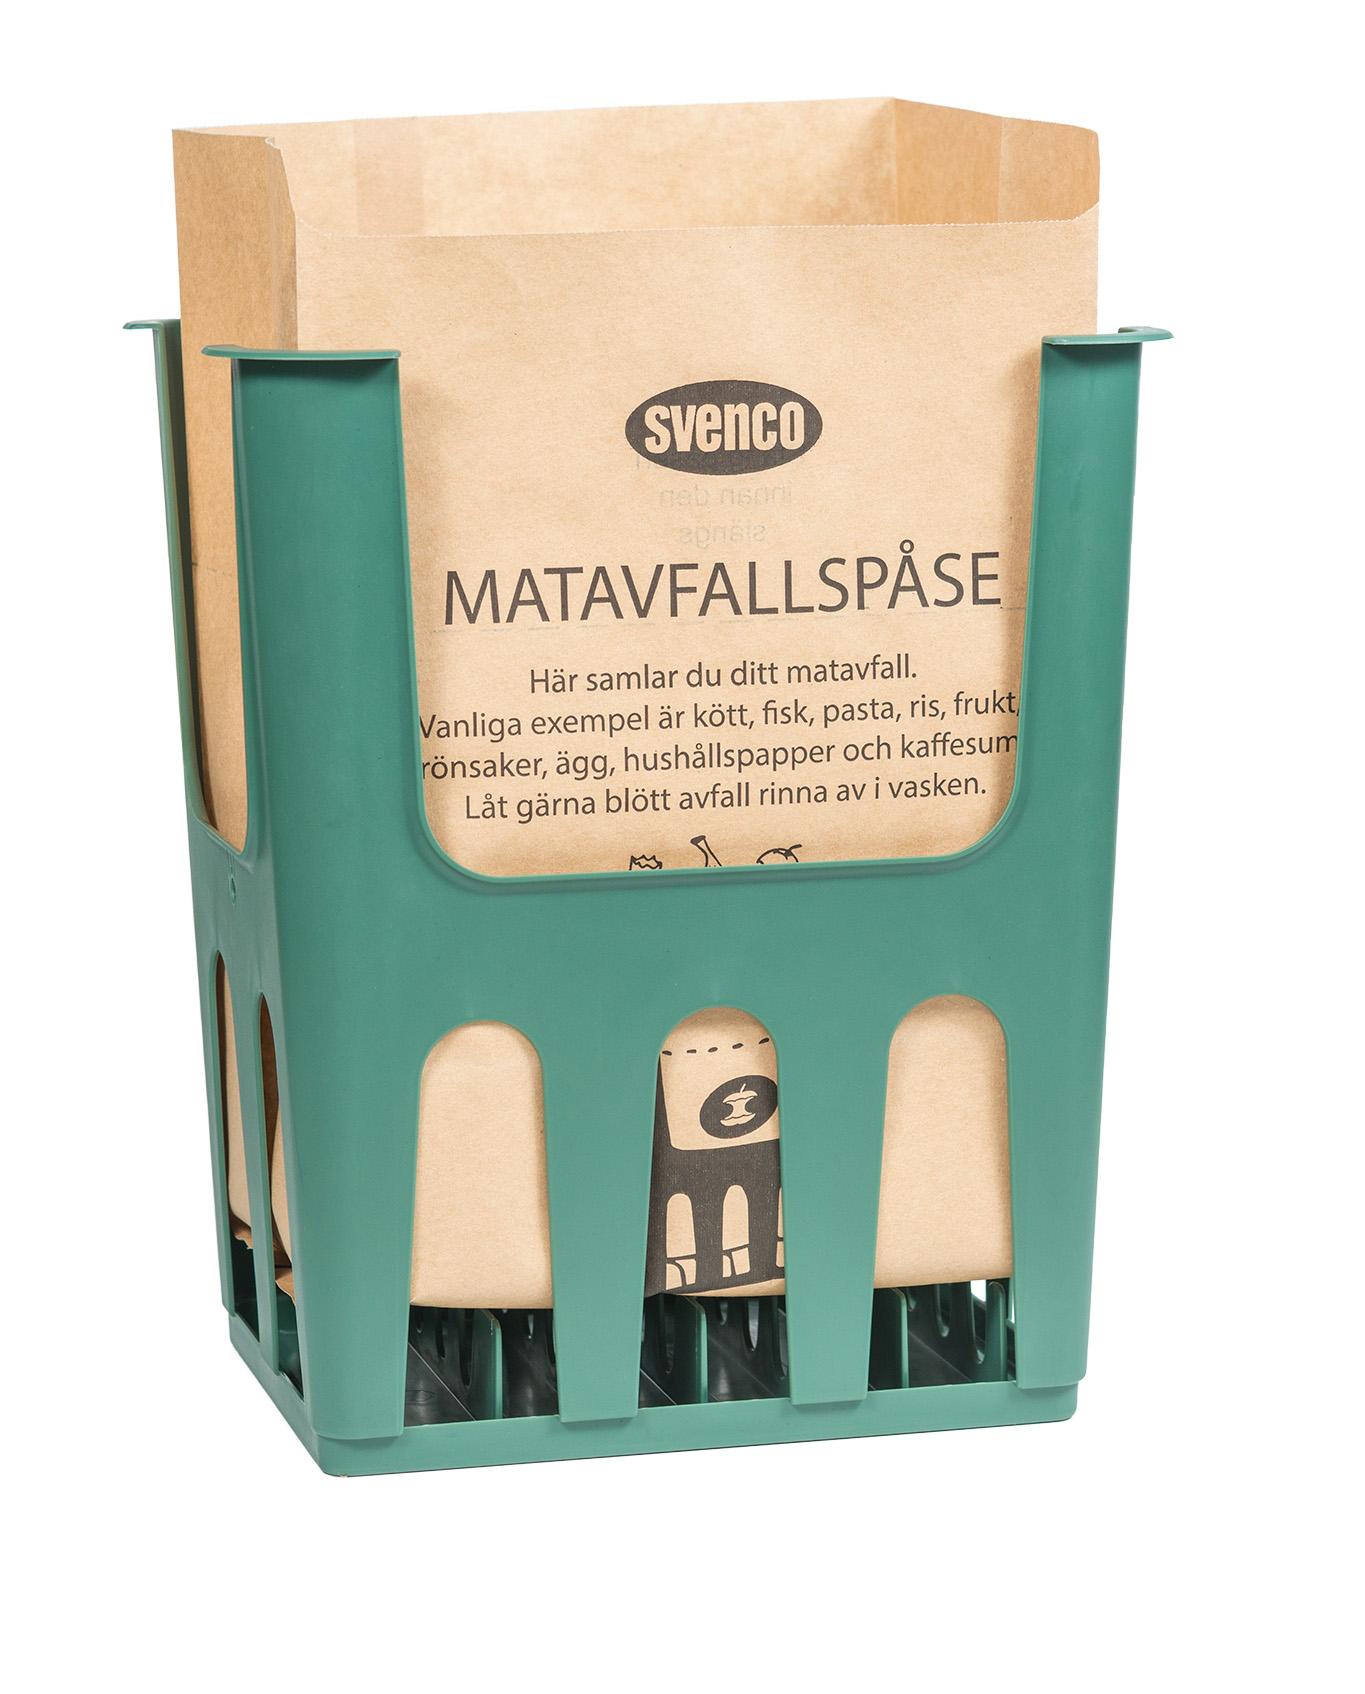 Matavfallspåse i ventilerad hållare - Mathilda - 1008STD - Svenco